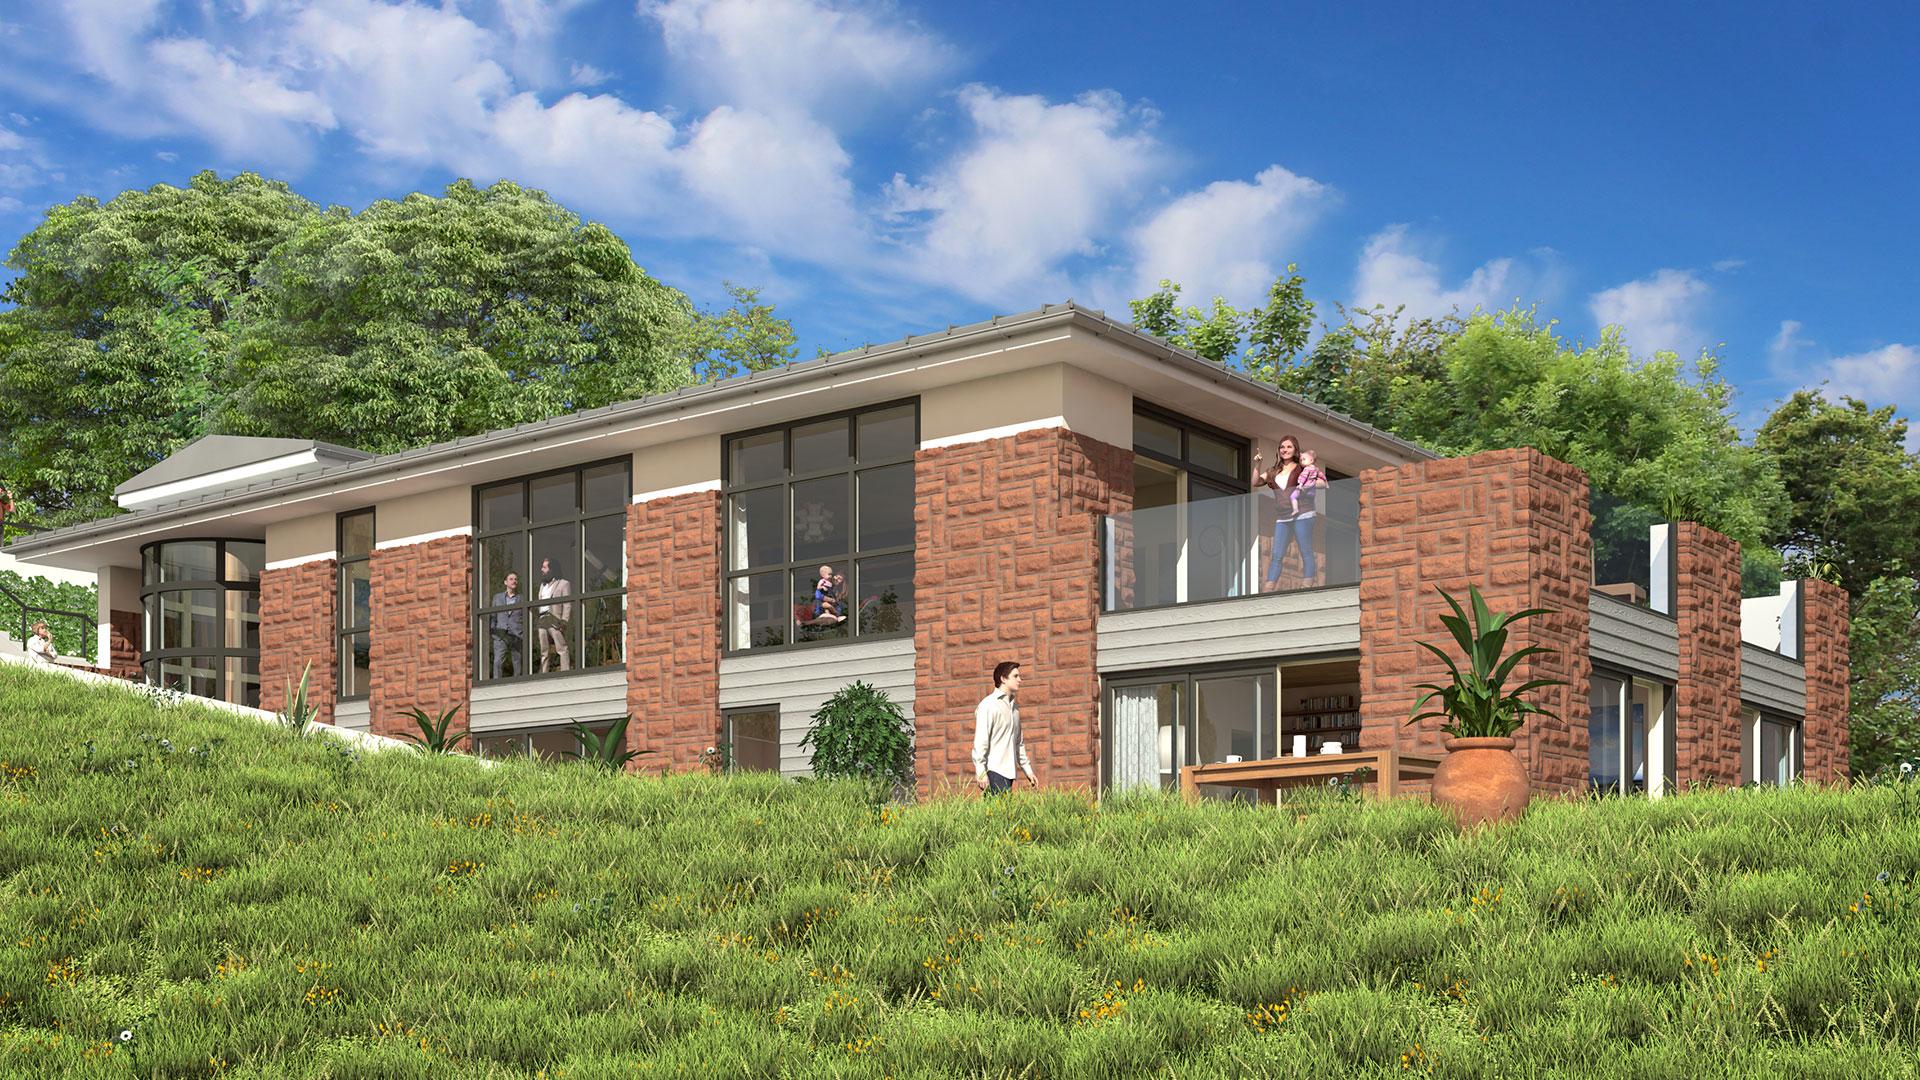 Cornwall property estate agent image CGI